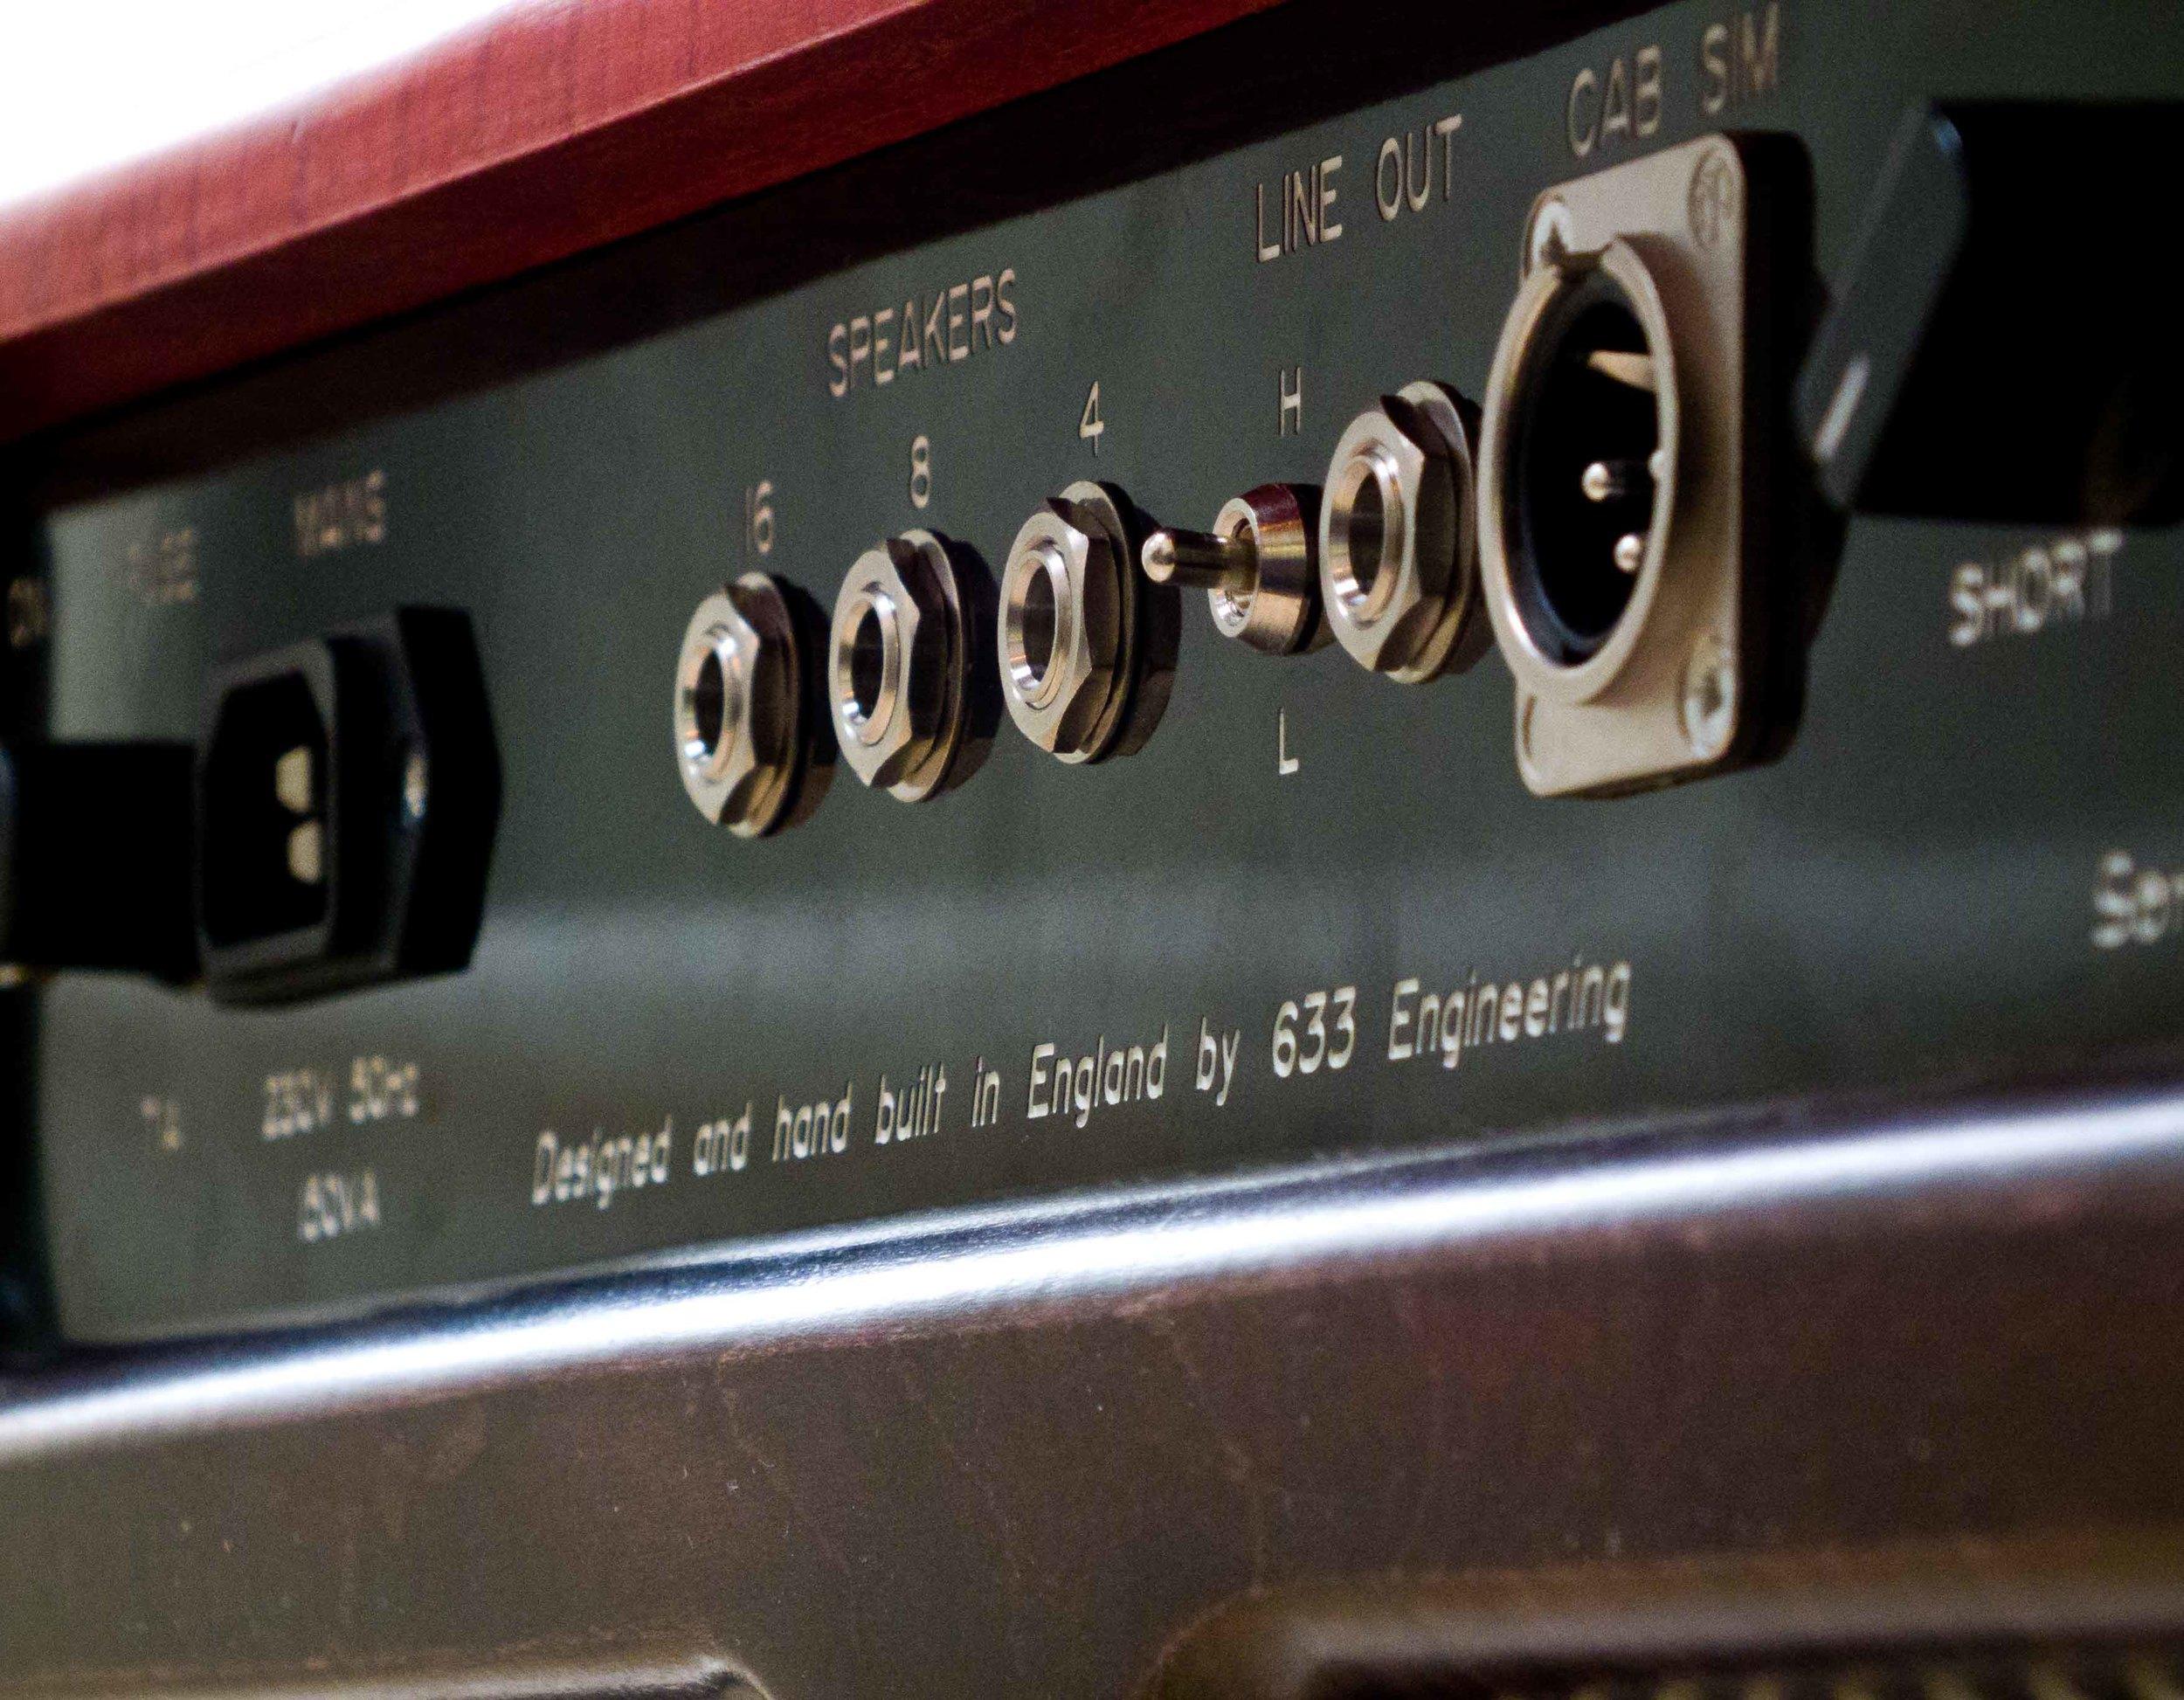 633 Engineering Ruby bespoke UK hand made guitar amplifier